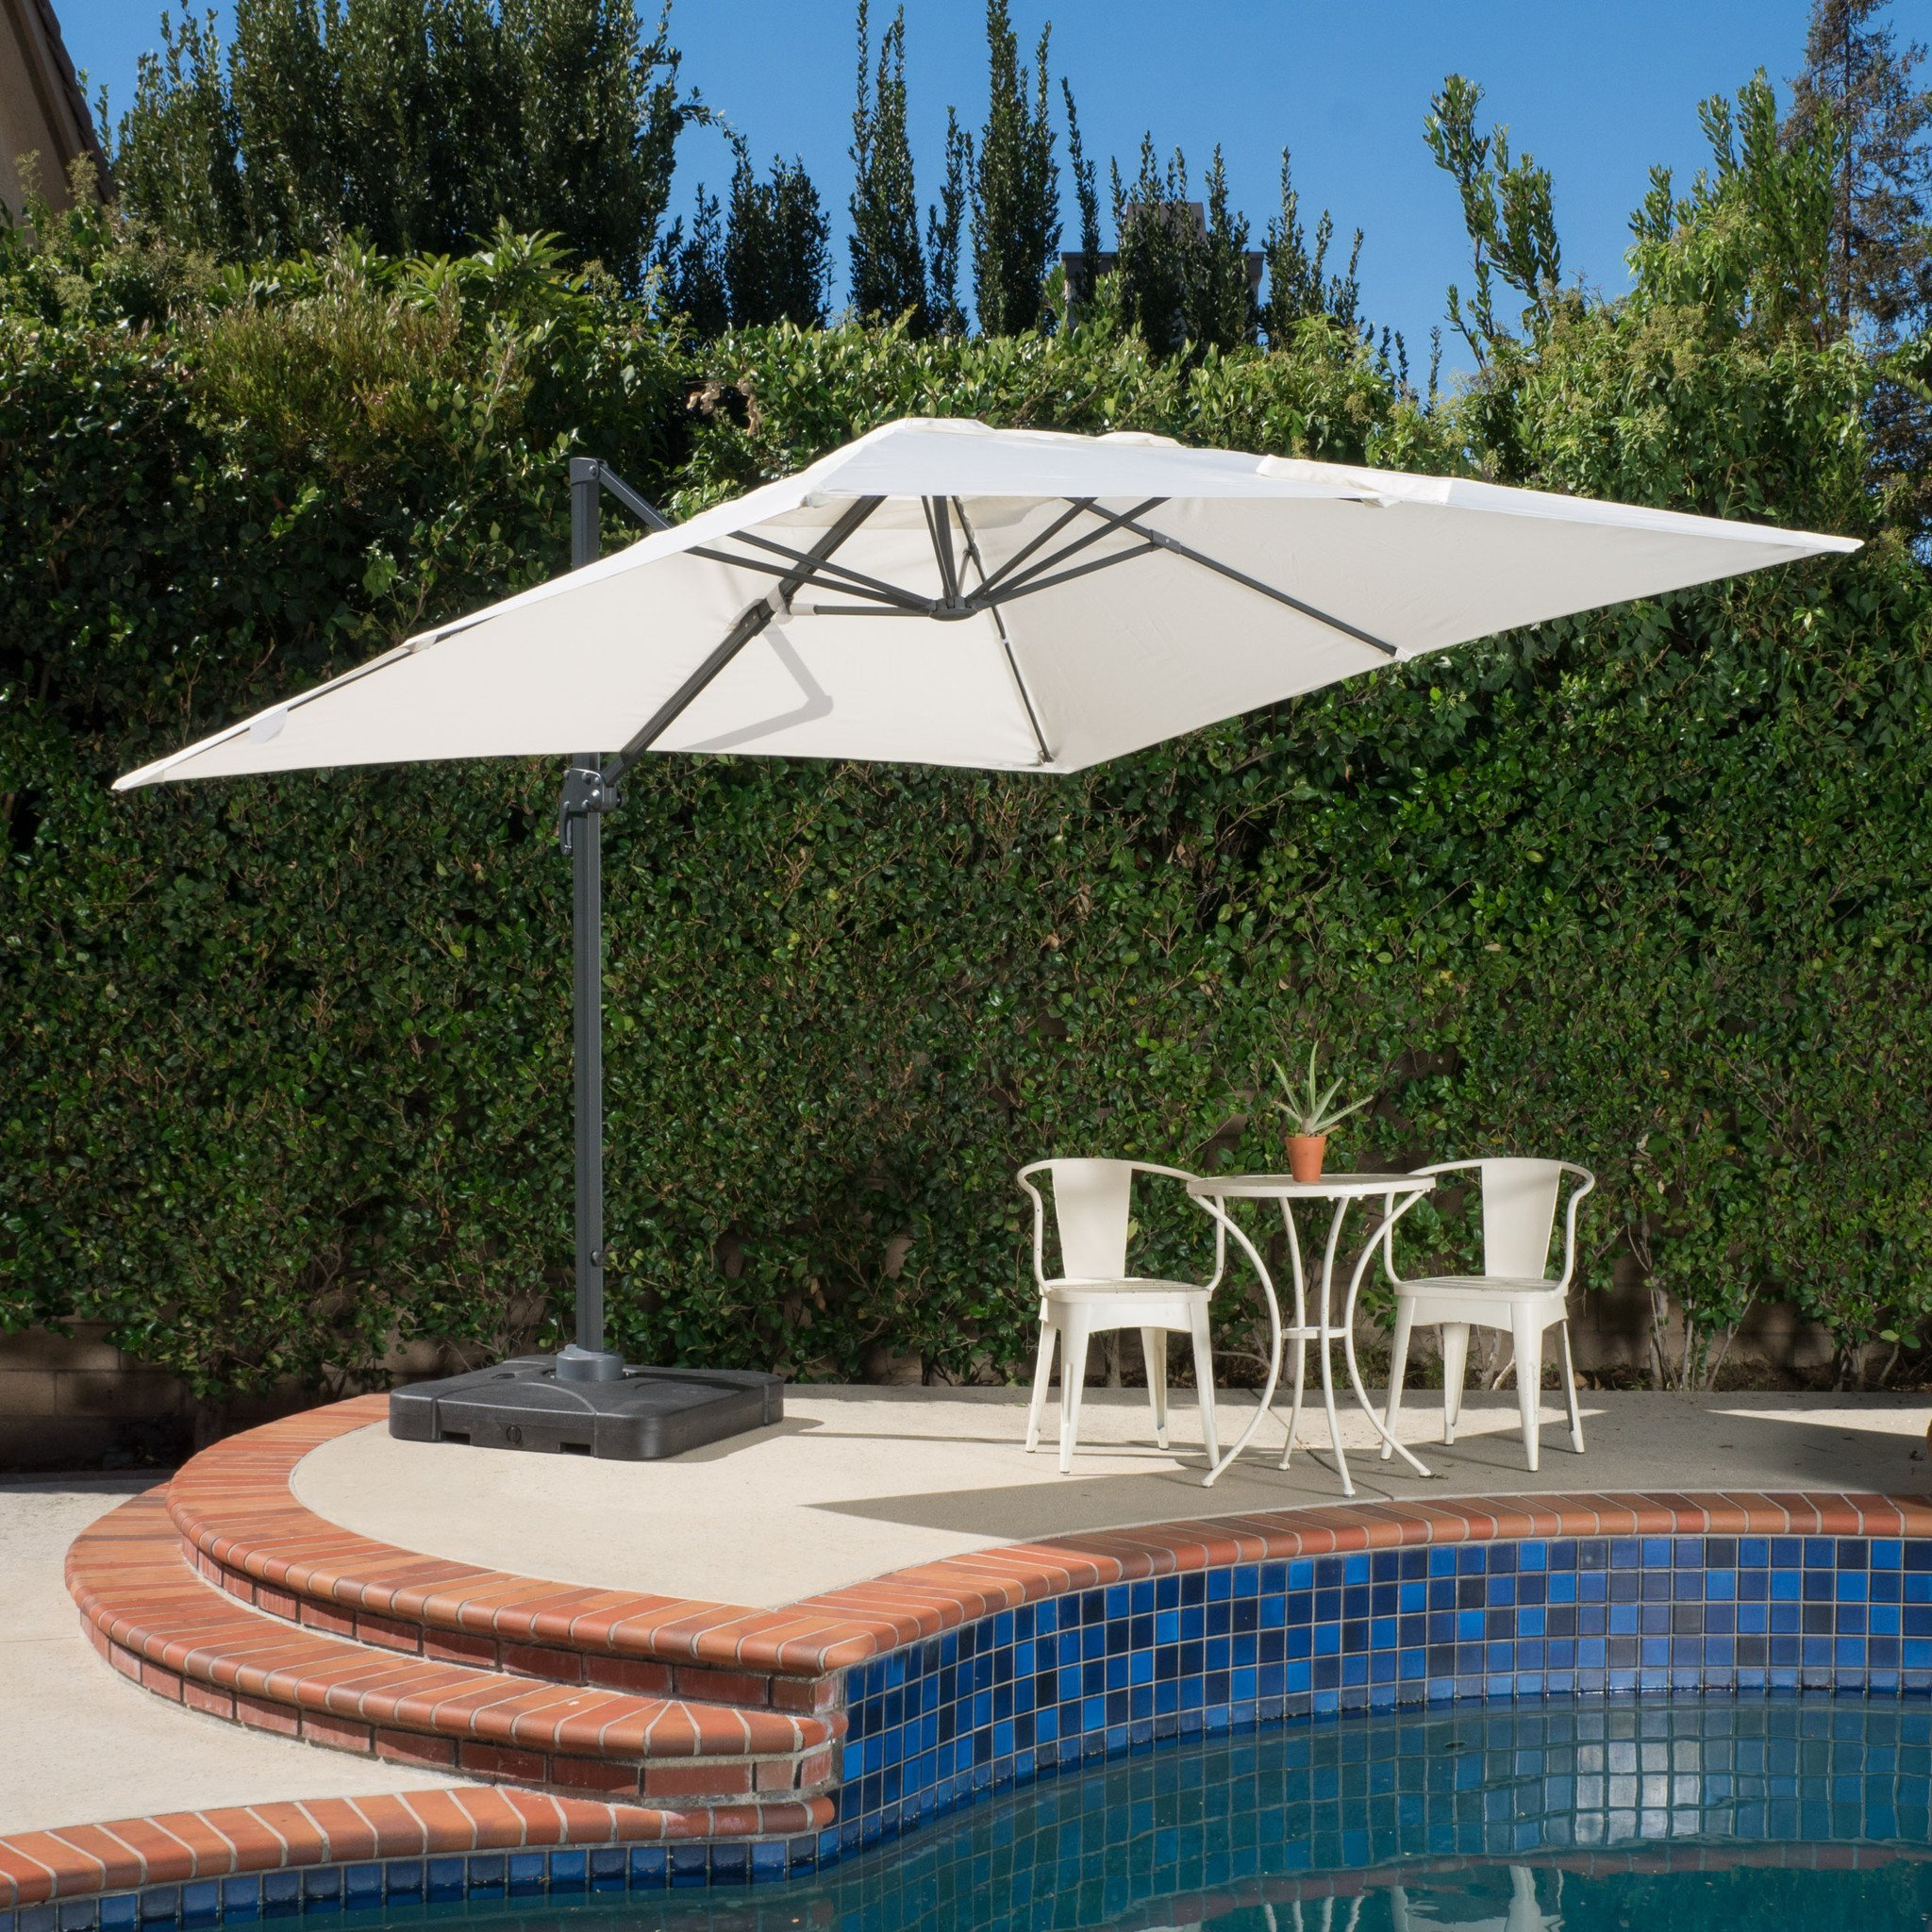 Lennie Cantilever Sunbrella Umbrellas For 2019 Denise Austin Home Sardinia Outdoor 9'8 Foot Canopy Umbrella With Stand (View 7 of 20)